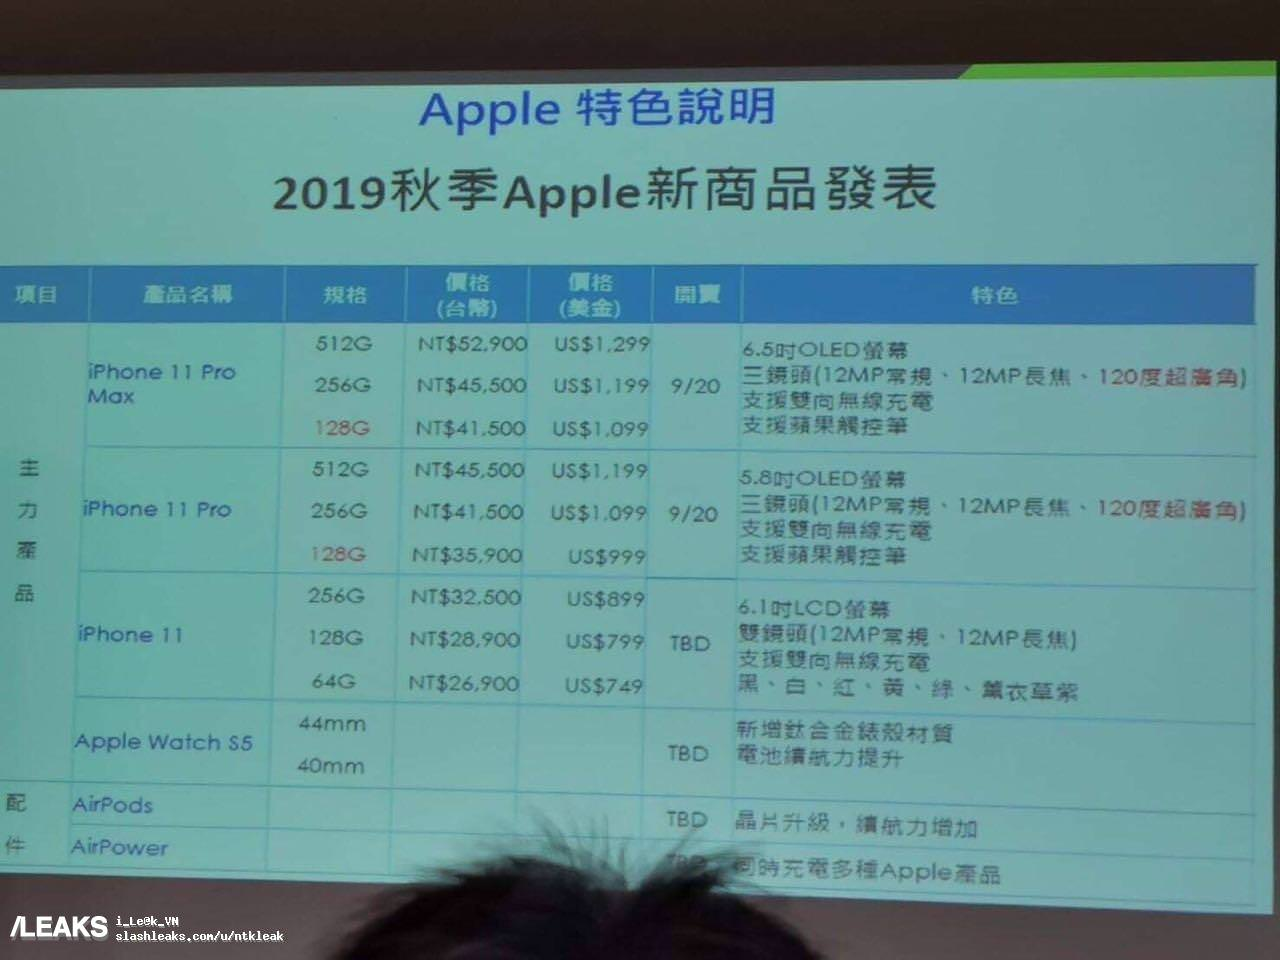 「iPhone 11」シリーズの価格やストレージ容量が判明?台湾の携帯電話キャリアから流出か